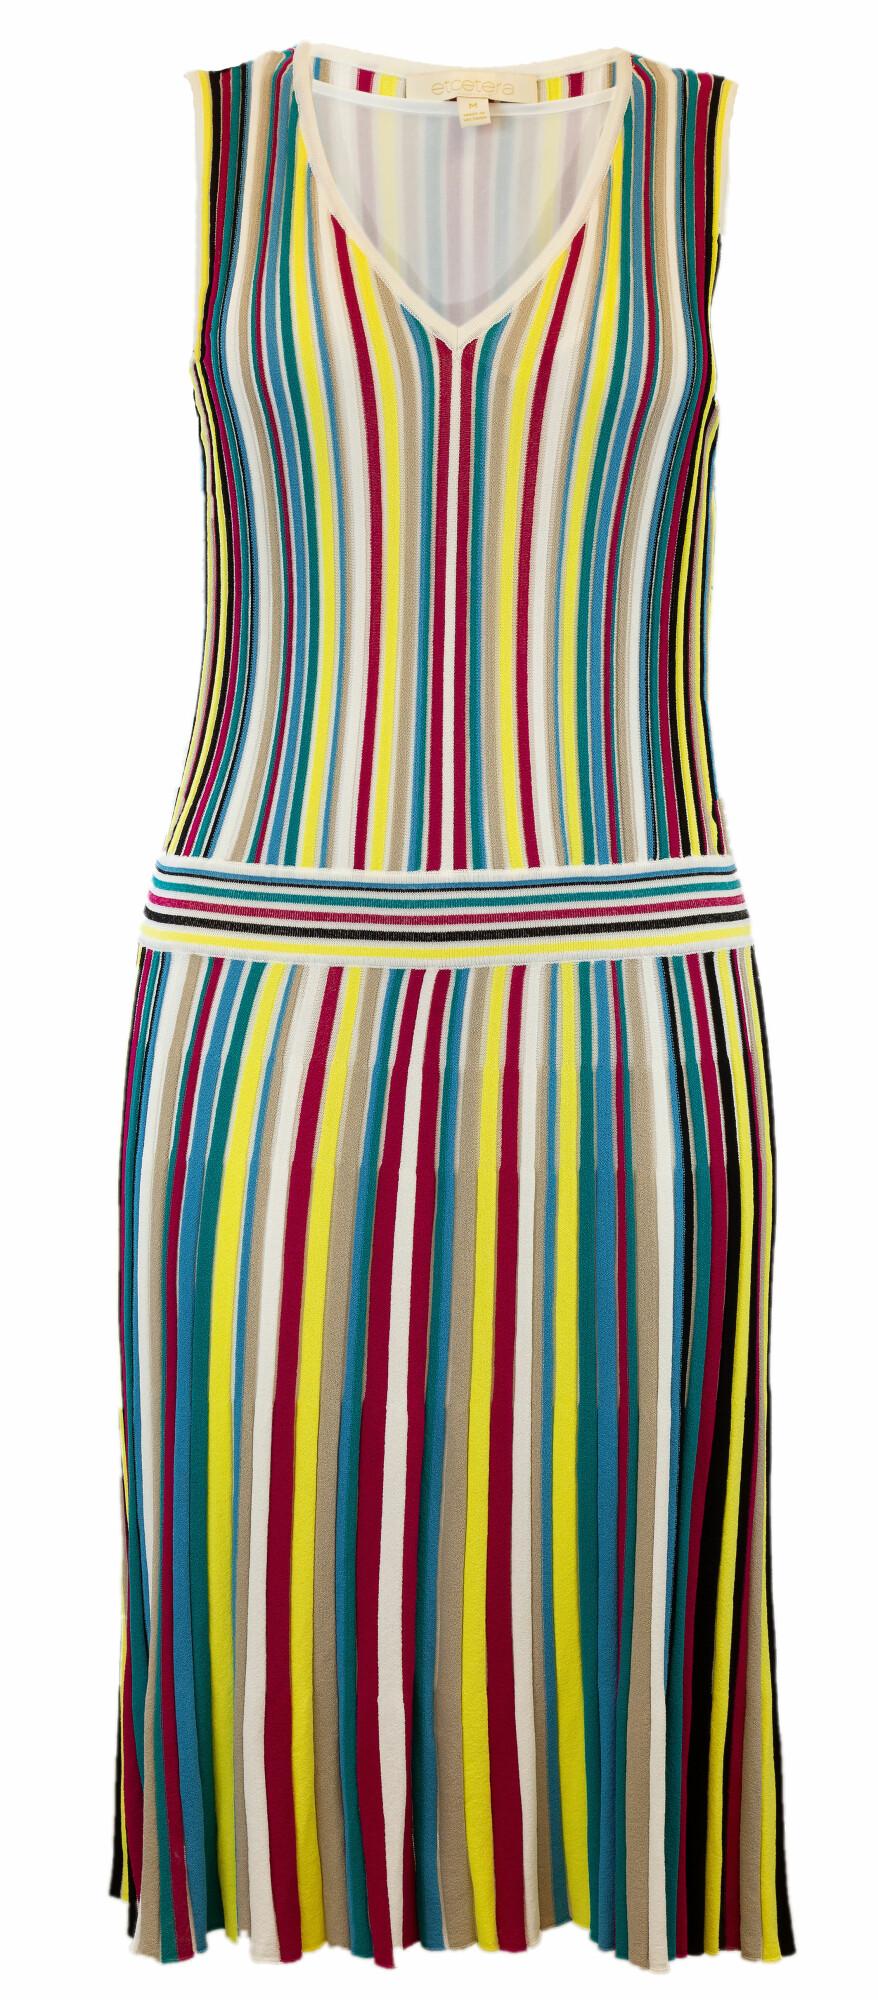 Etcetera Carolina Dress, Strips, Viscose Fabric, Light Fit, Versatile Style - M - Colorful Stripes